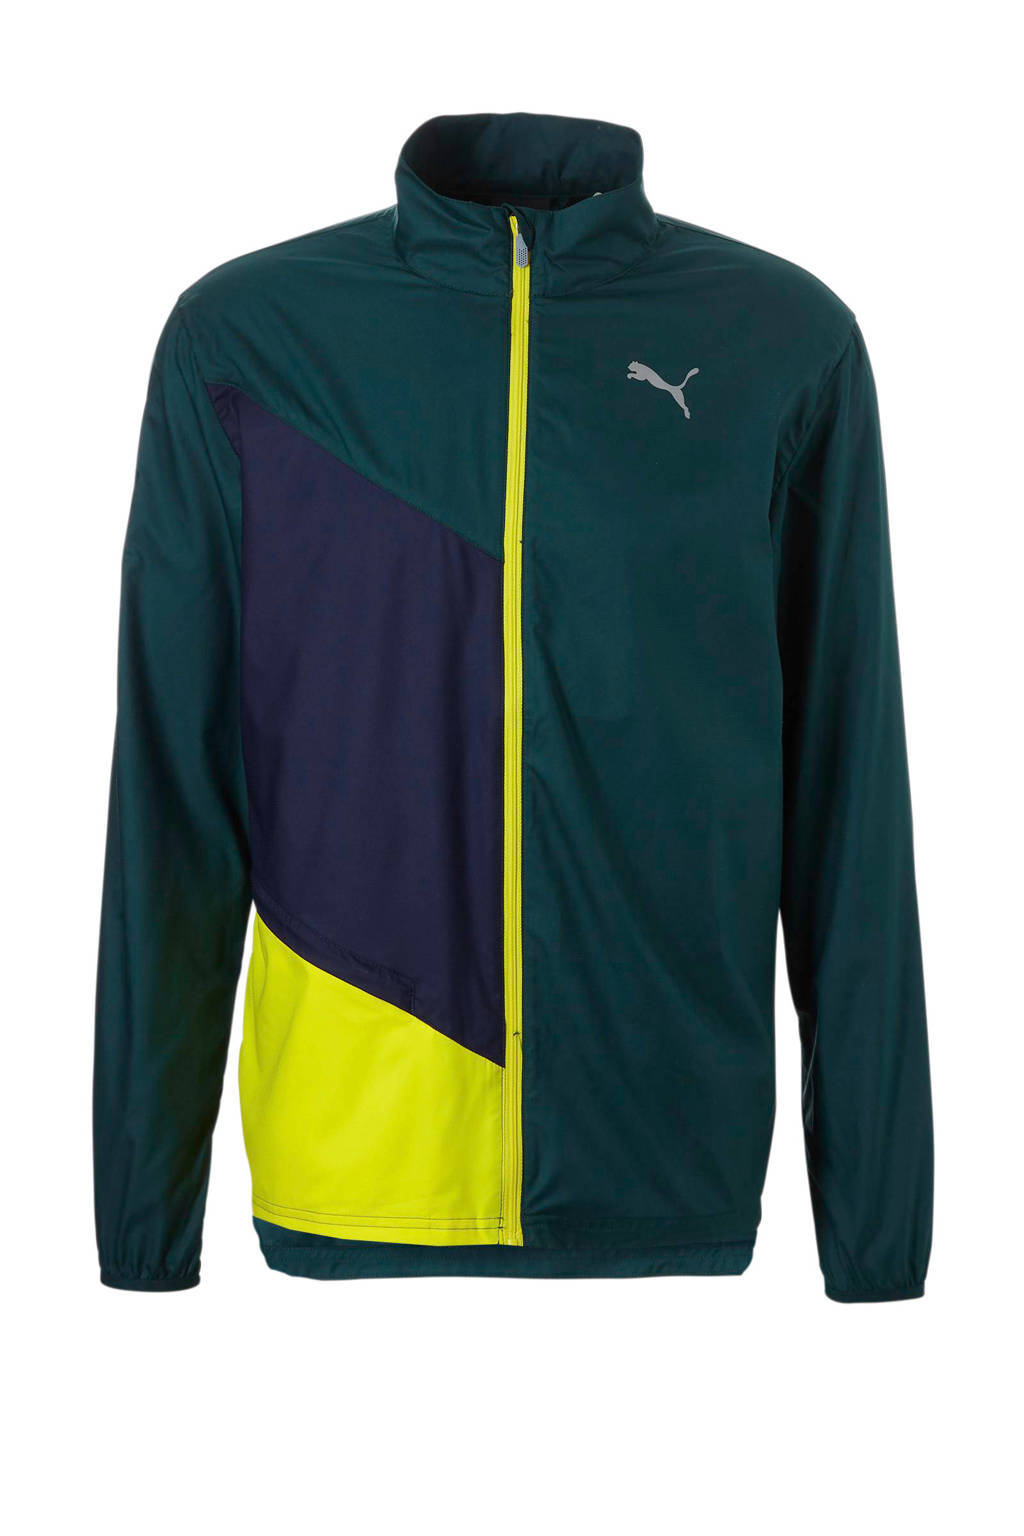 Puma hardloopjack groen, Groen/blauw/geel